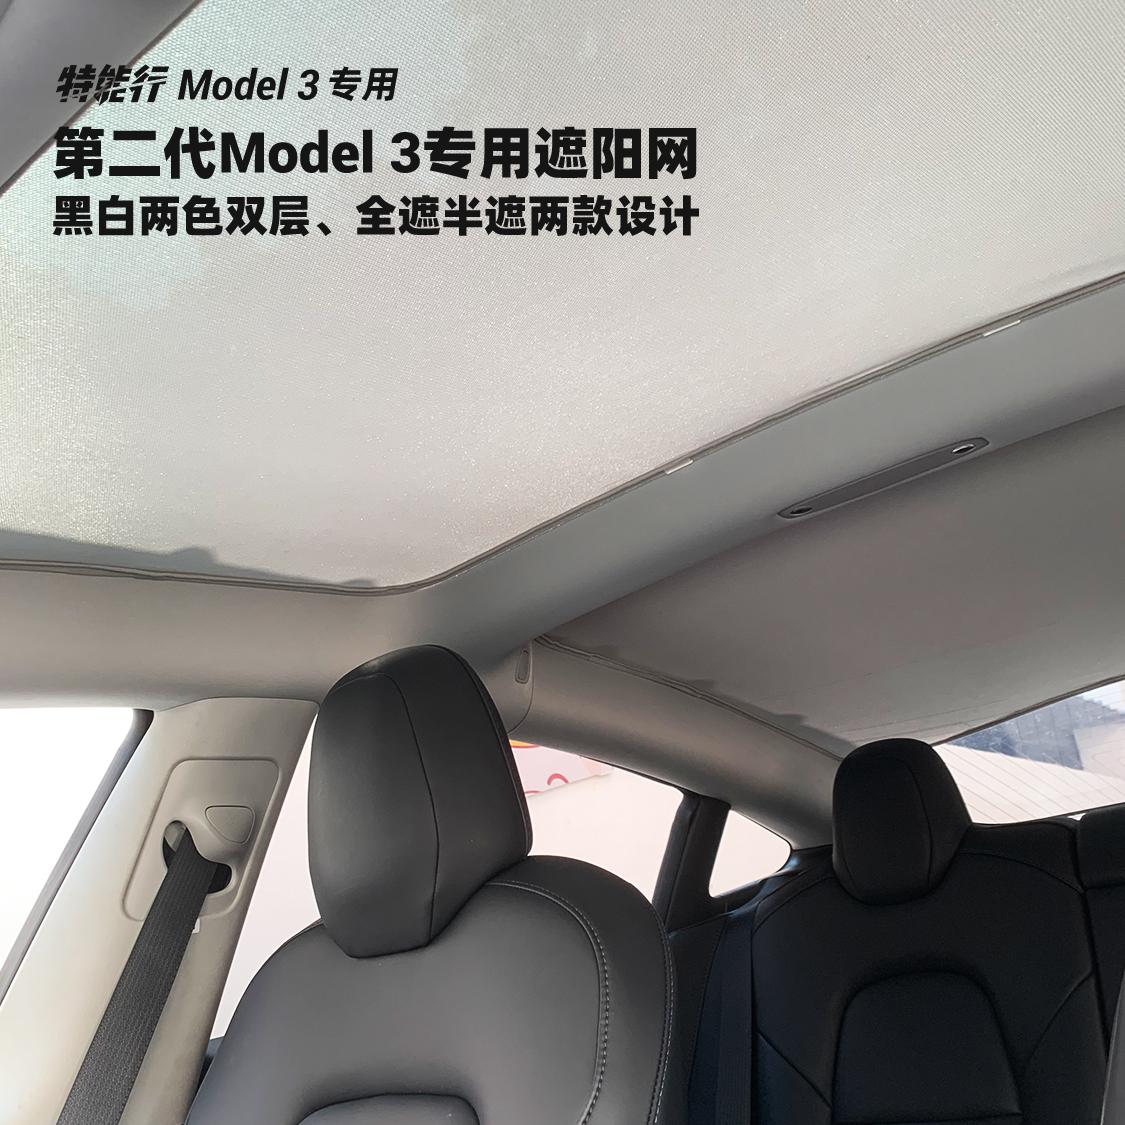 Model 3专用夏季防晒遮阳网网纱两片装